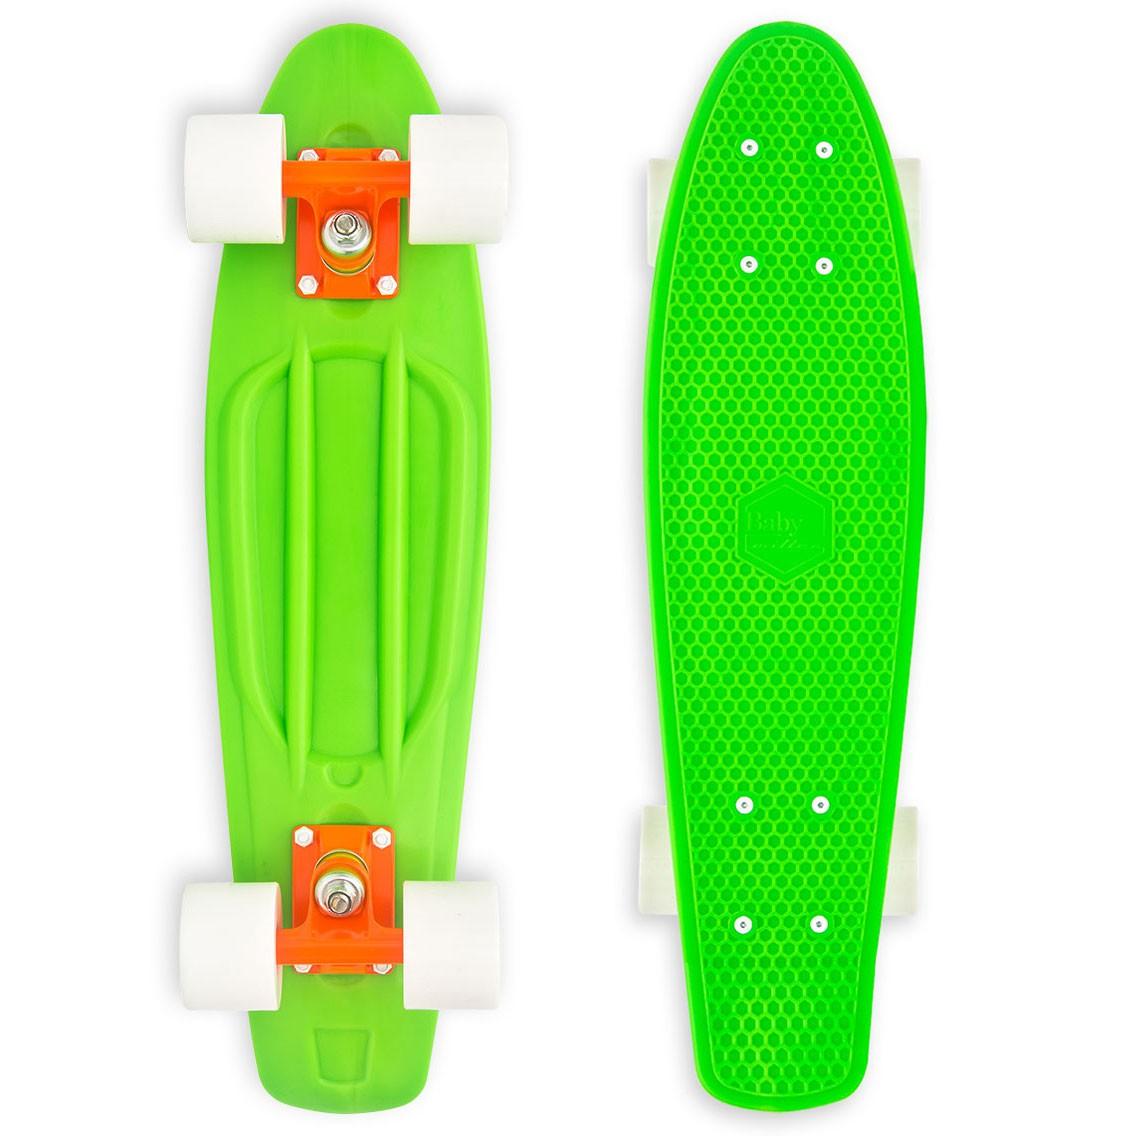 Longboard Baby Miller Original fluor green